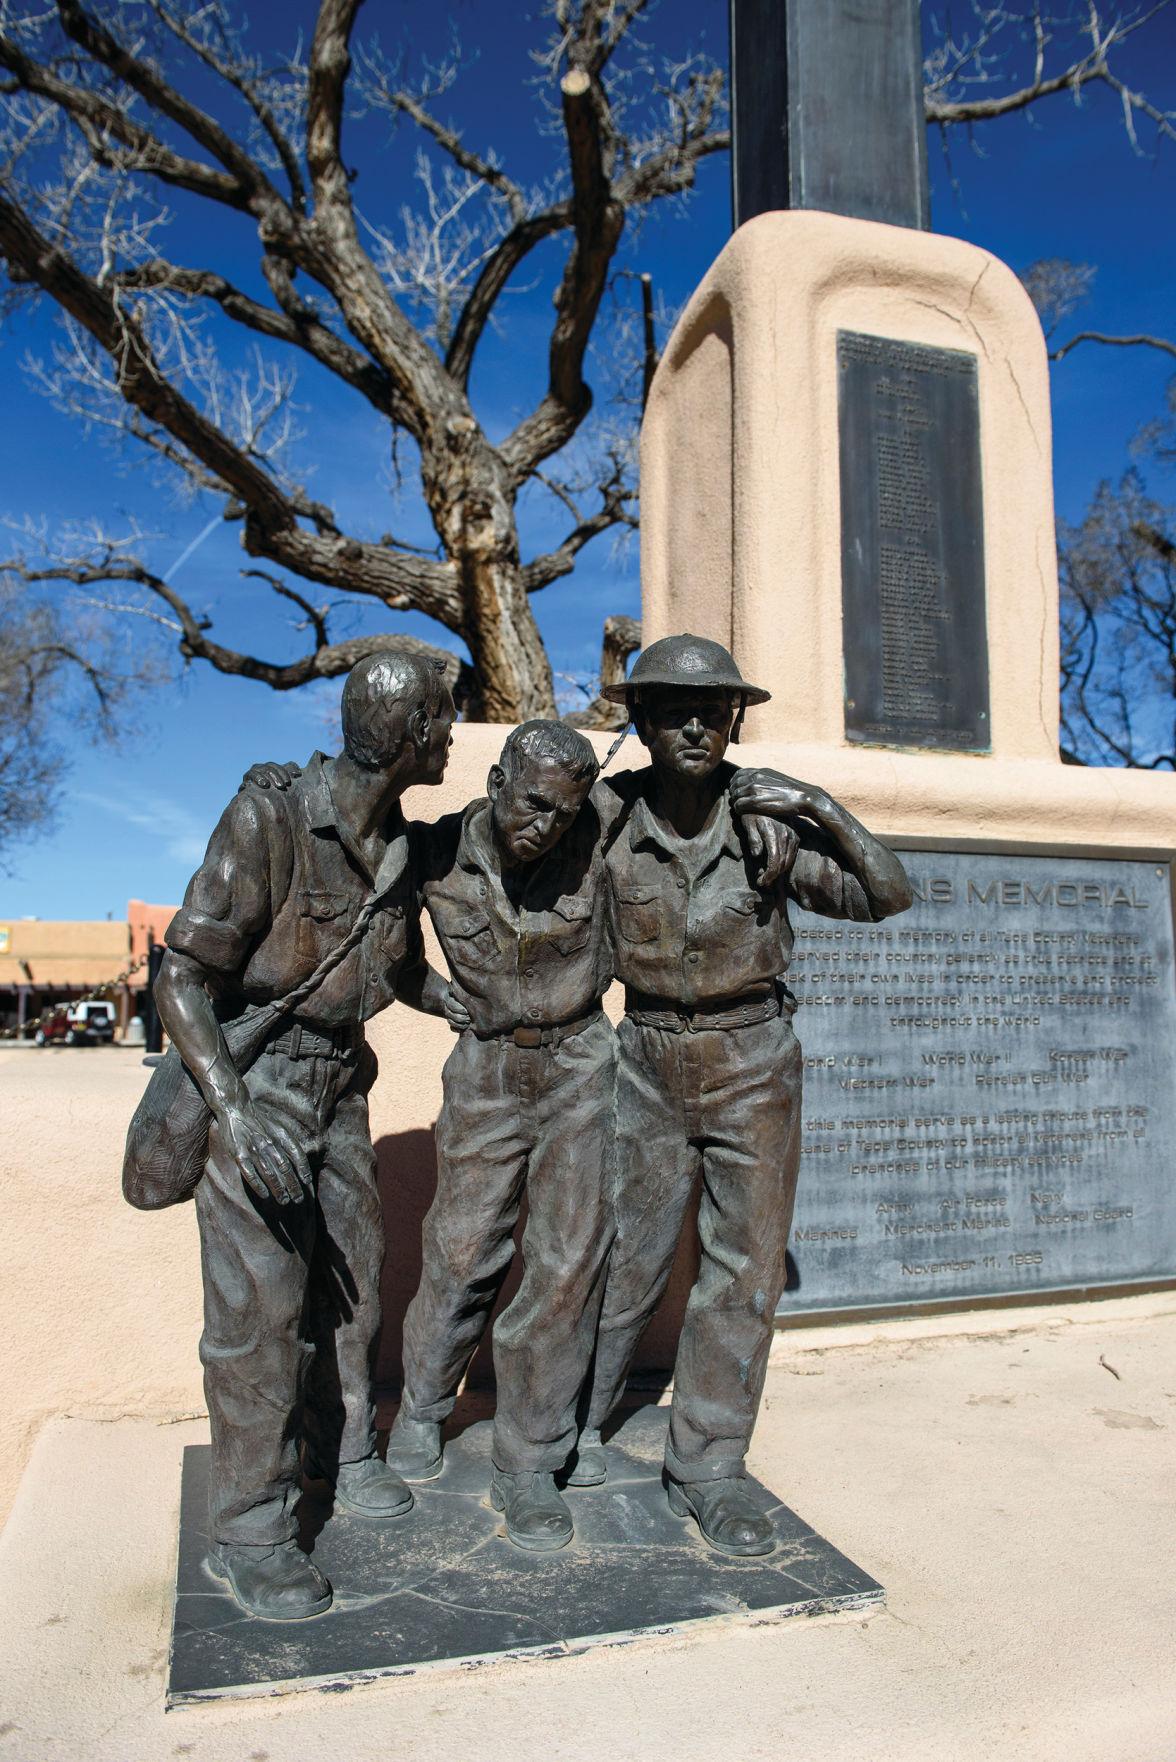 Taos Plaza war memorial cross resurrects church-state debate